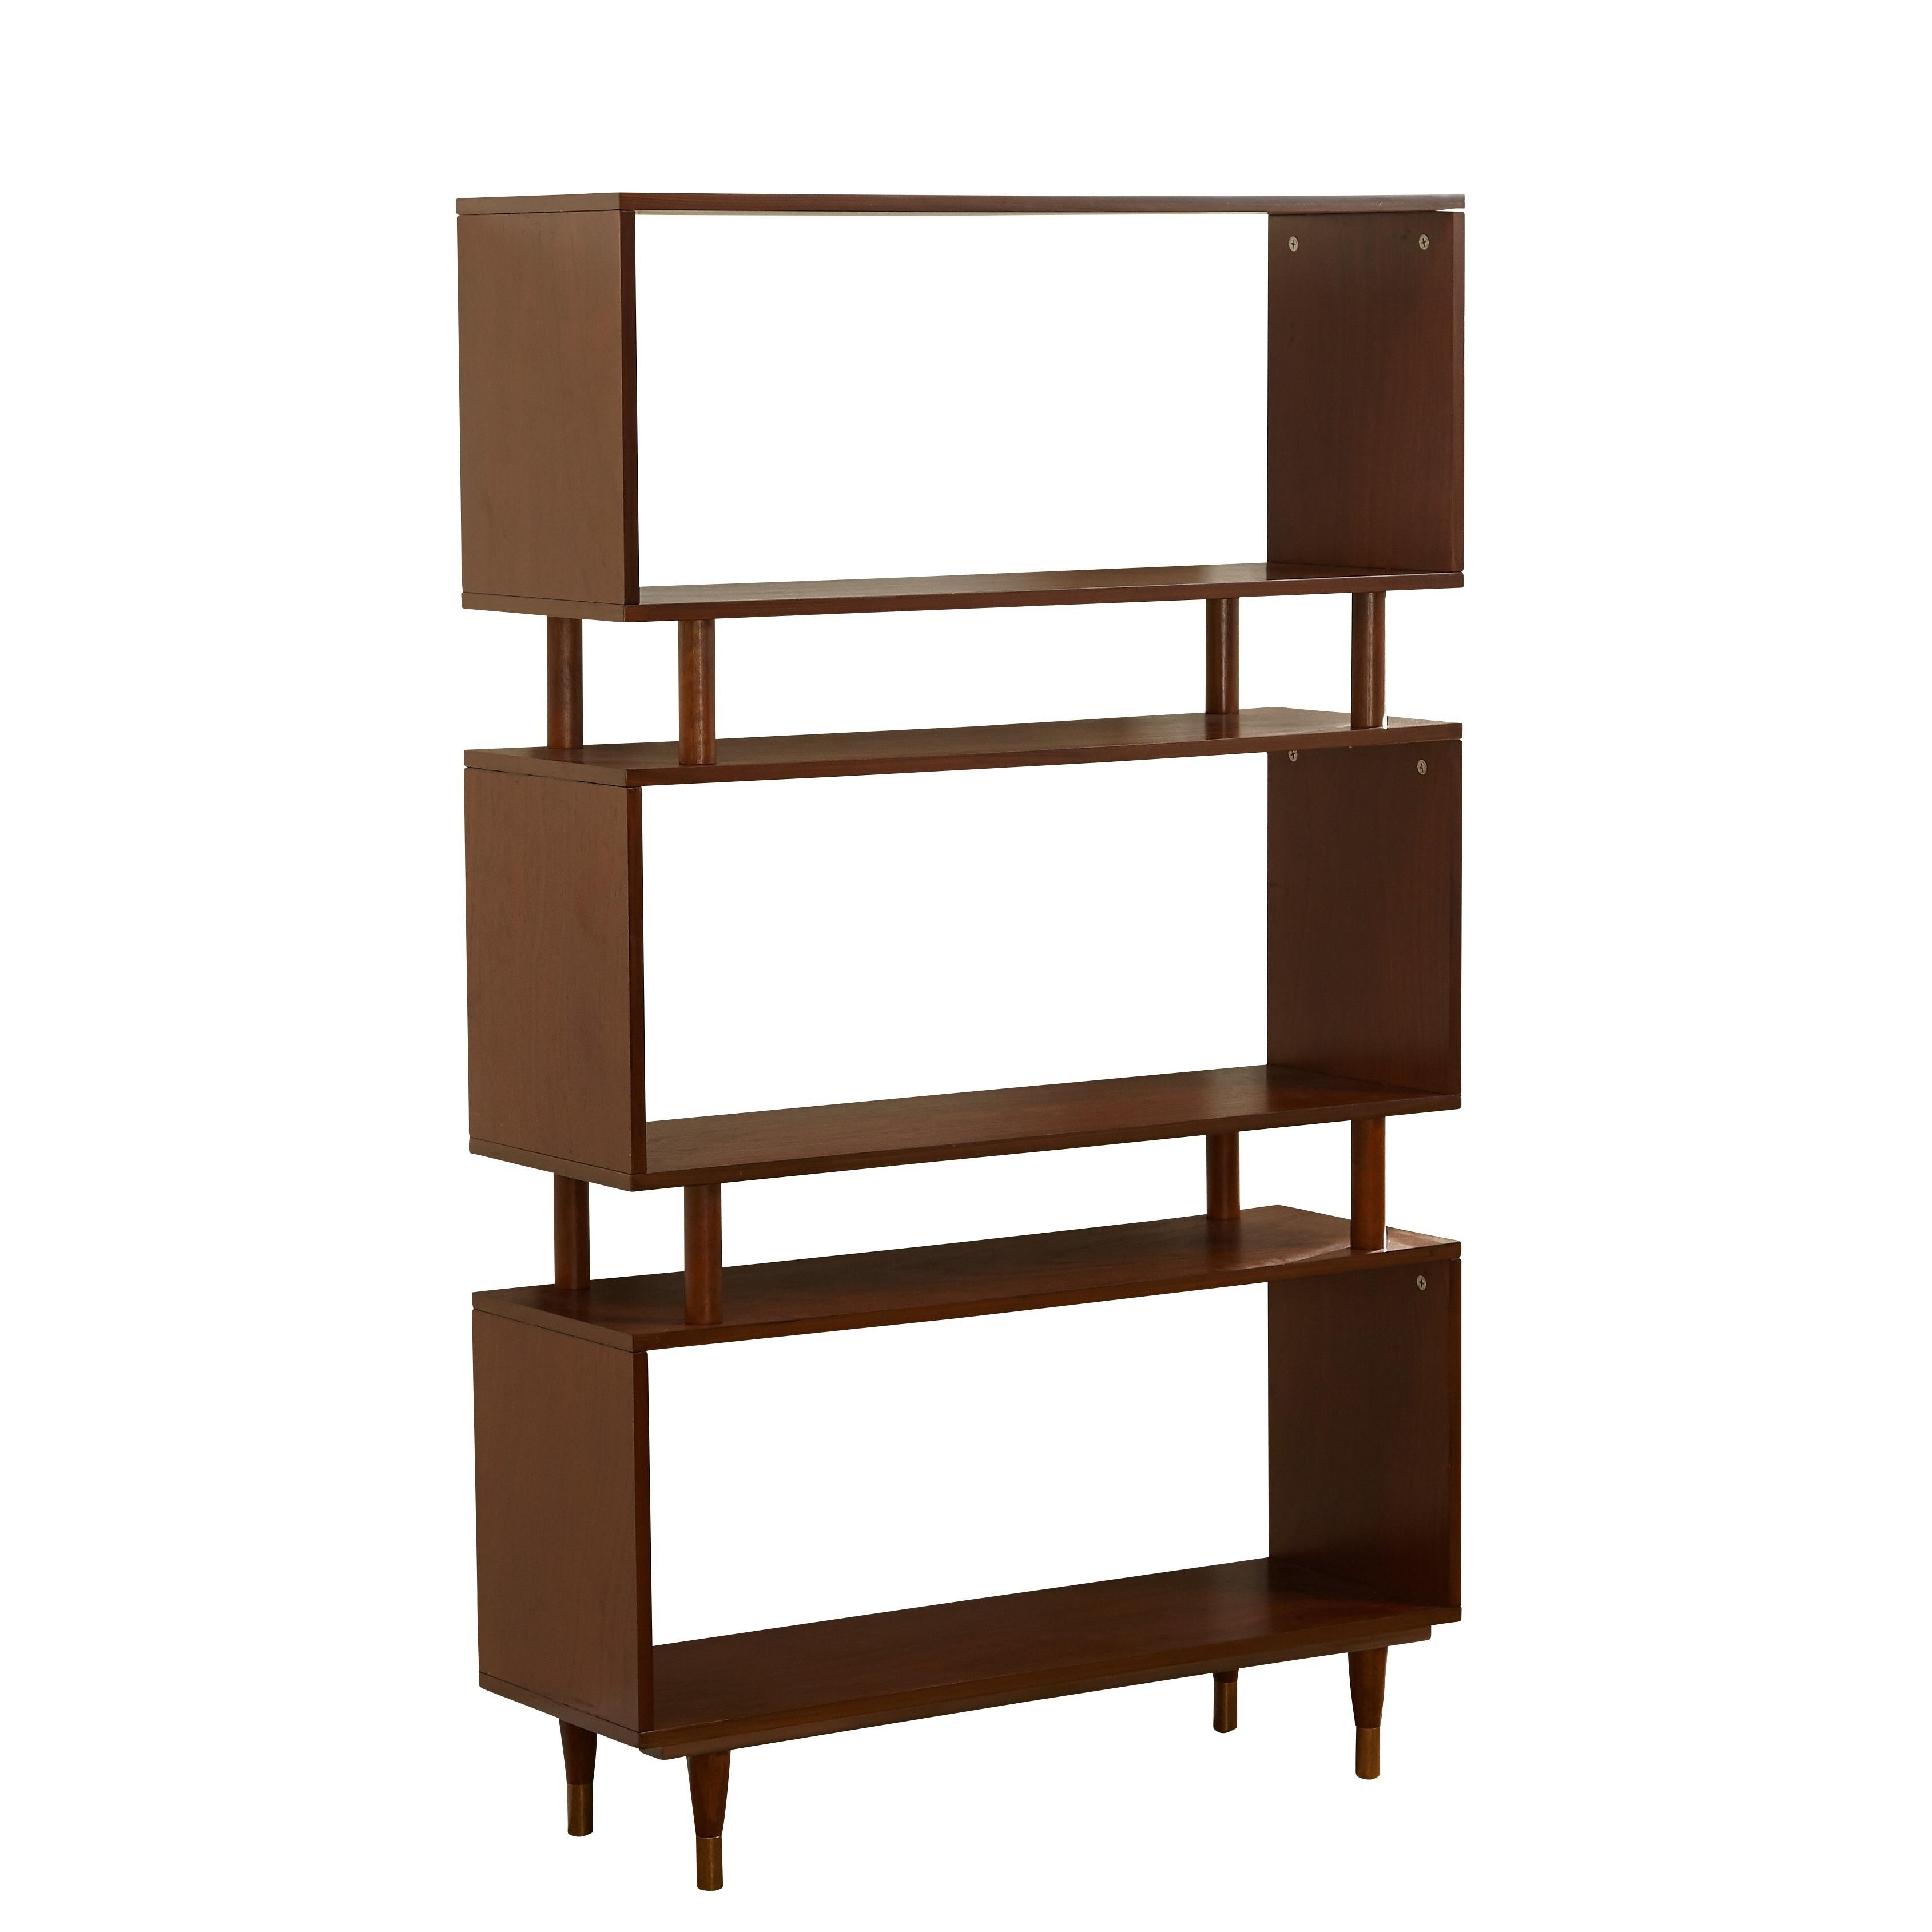 Simple Living Margo Mid Century 3 Shelf Bookshelf